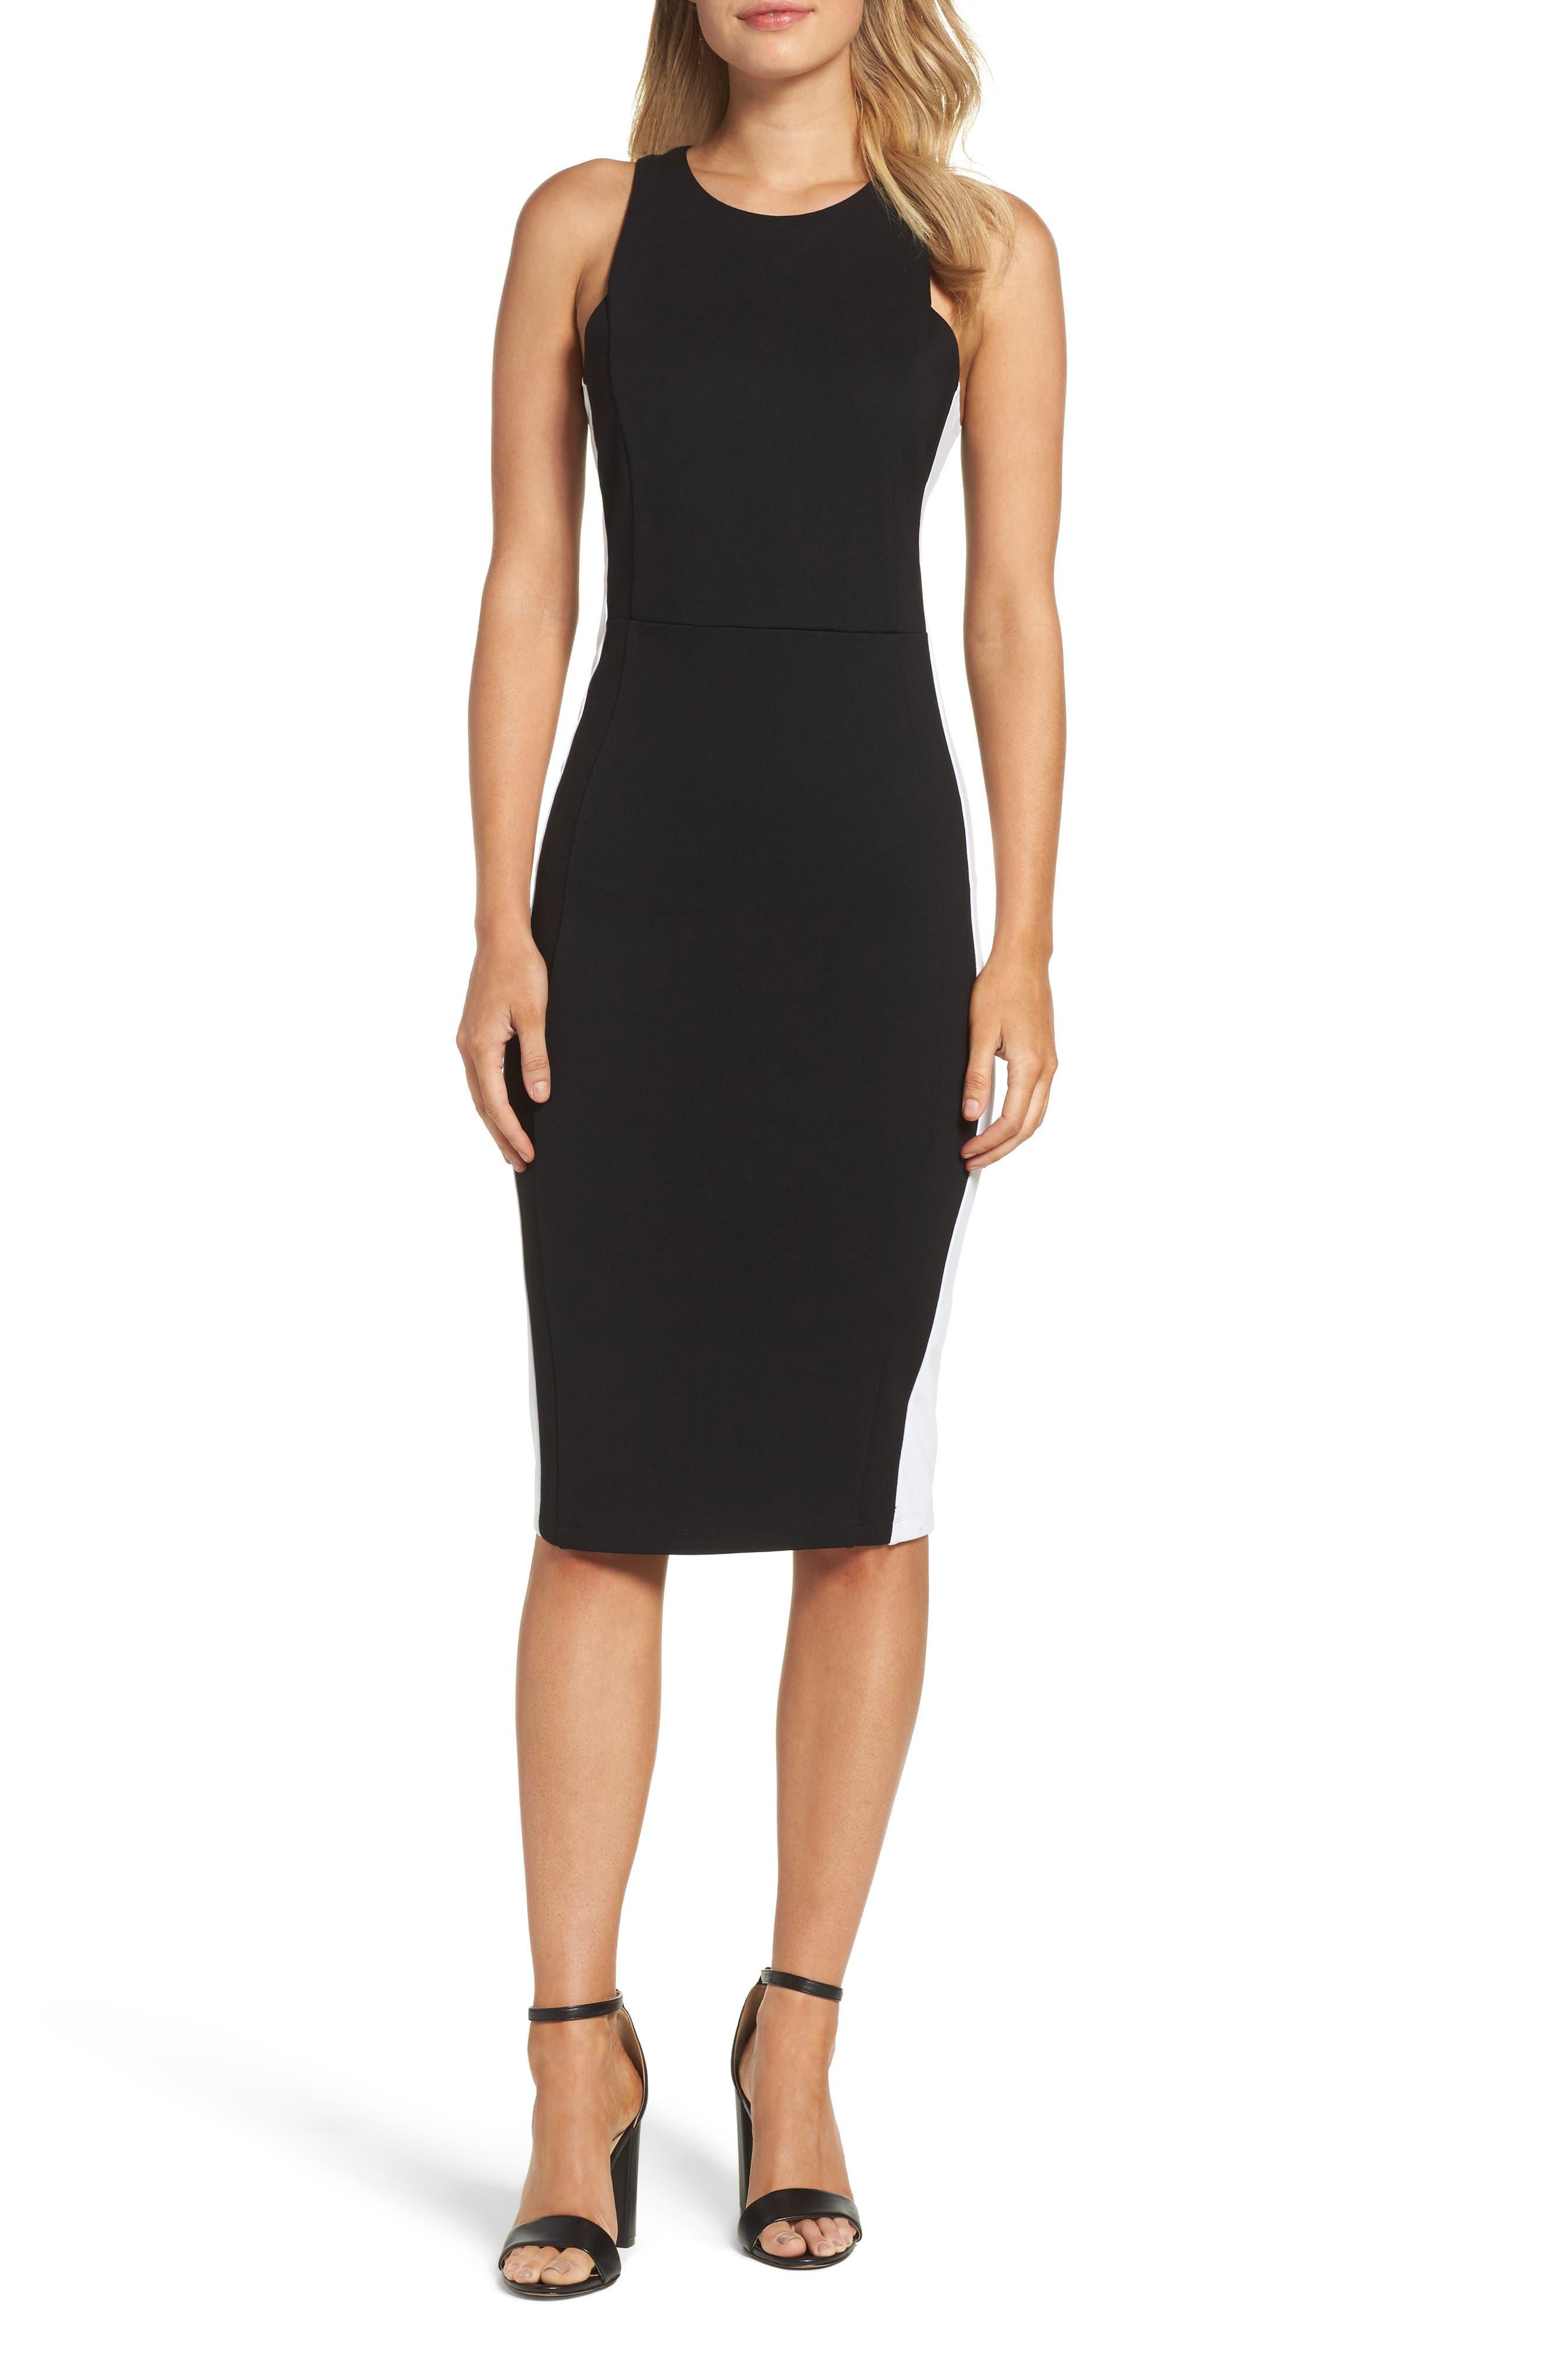 Orlanda Ponte Knit Sheath Dress,                             Main thumbnail 1, color,                             Black/ White